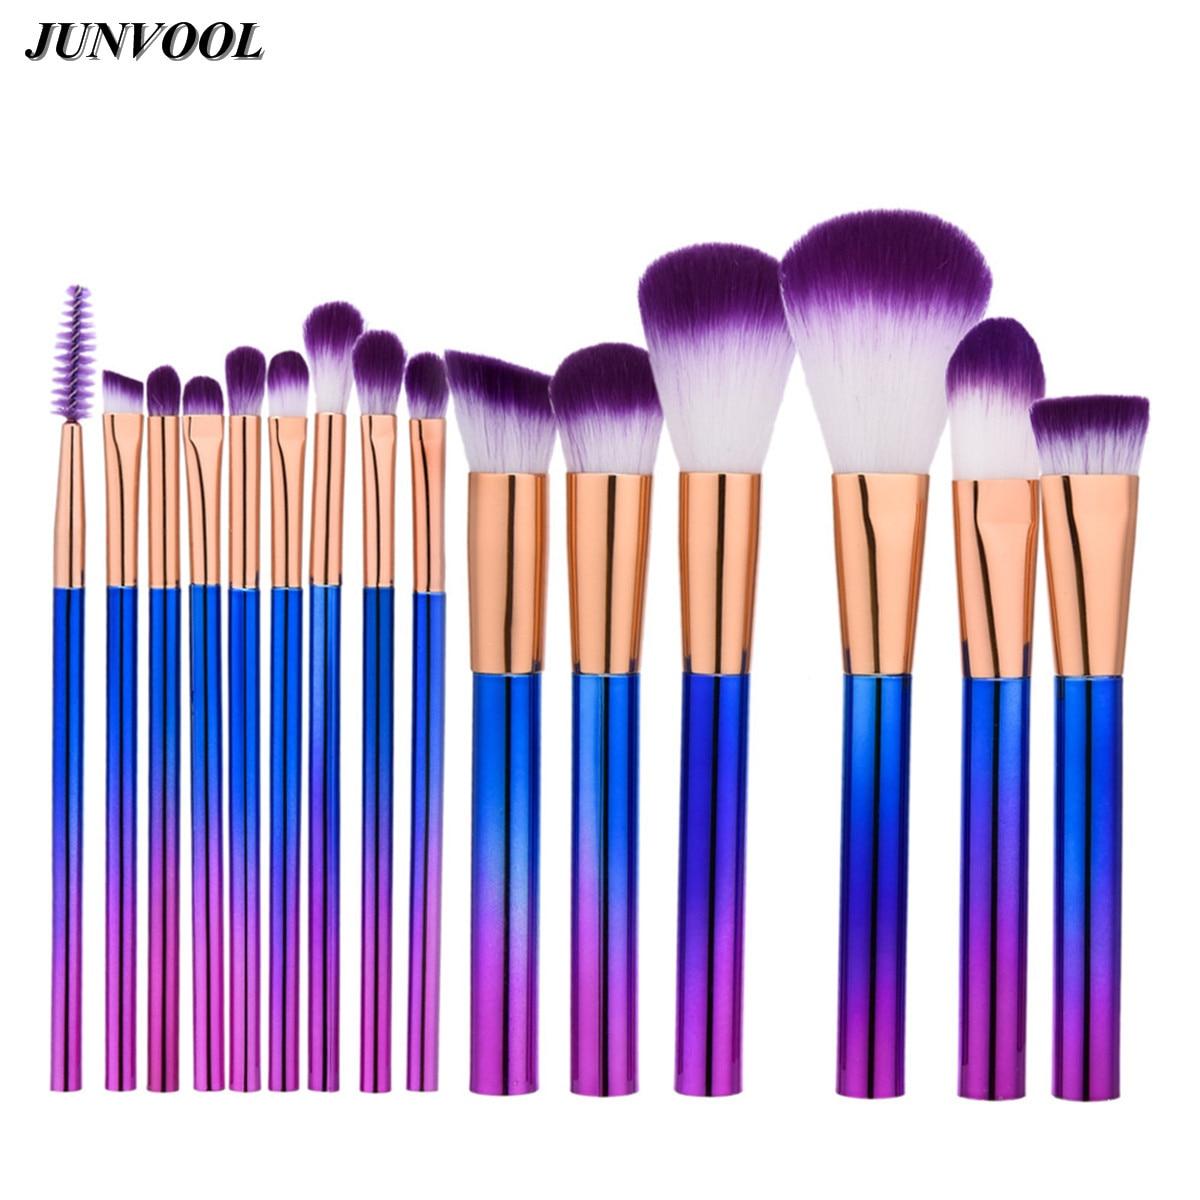 Pro 15pcs Purple Makeup Brushes Set Powder Foundation Eyeshadow Eyeliner Lip Contour Concealer Smudge Brush Cylindrical Handle mac splash and last pro longwear powder устойчивая компактная пудра dark tan